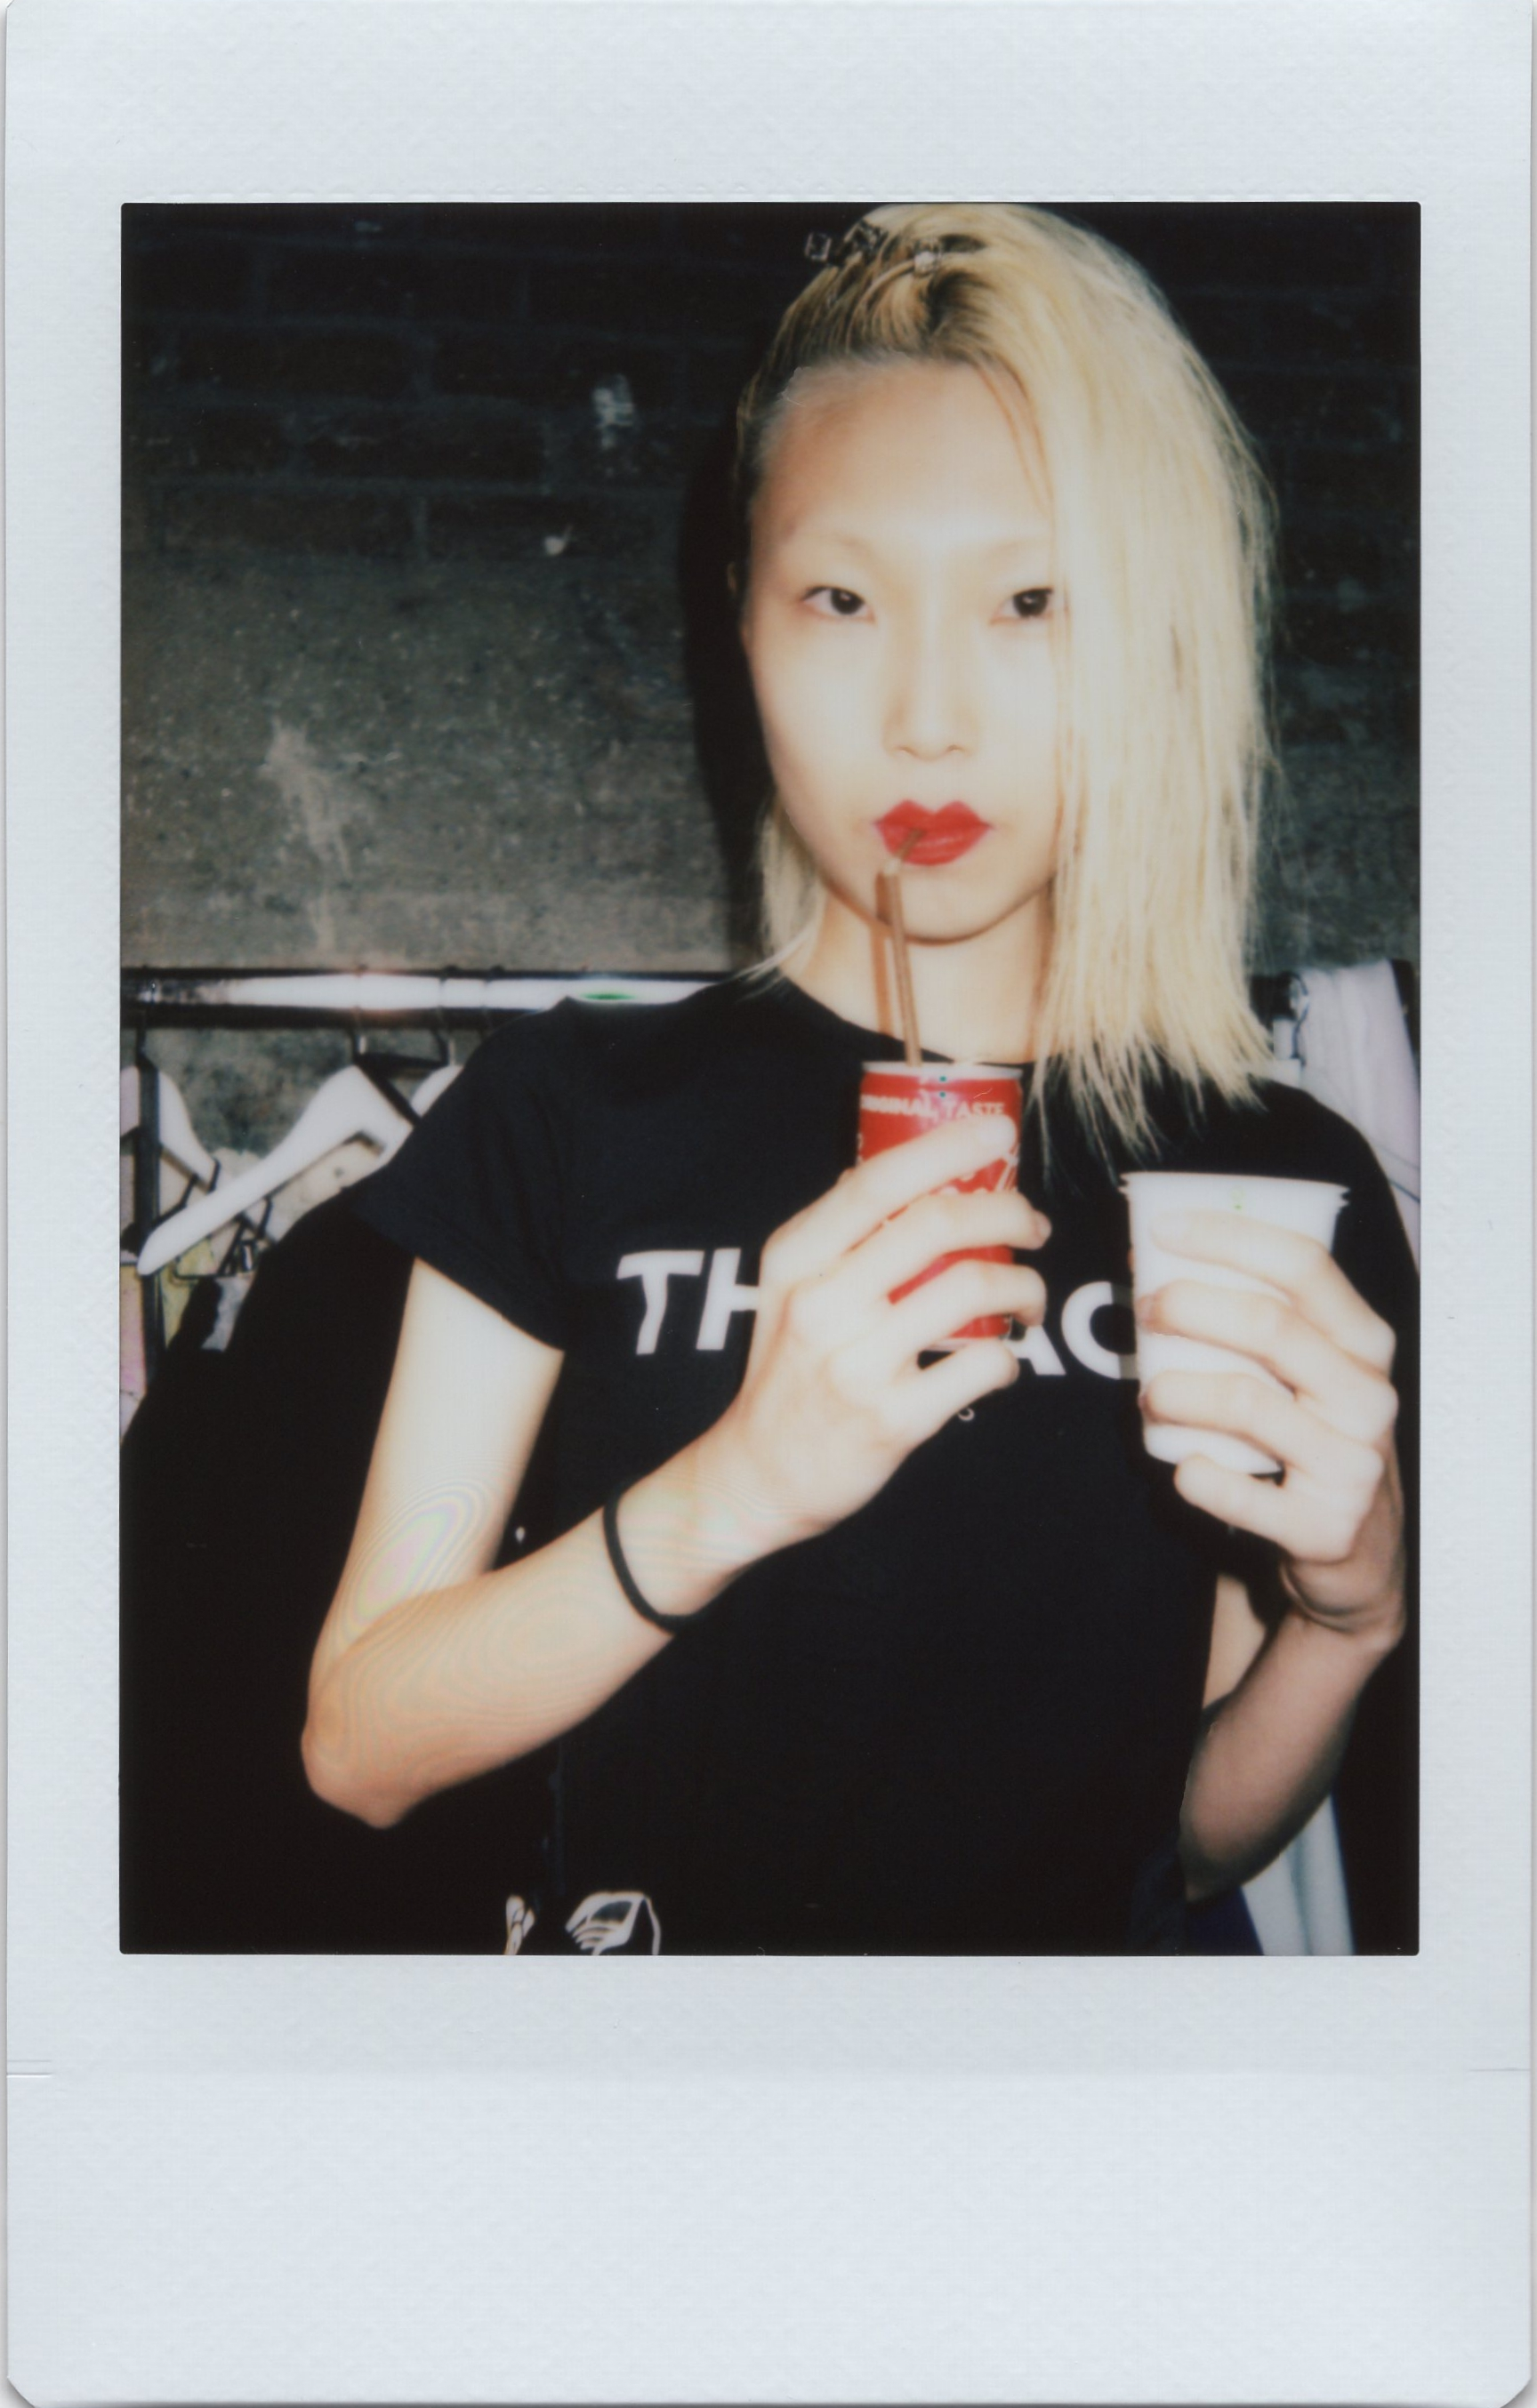 Mashama_Honigschreck_Backstage_Polaroid_1.jpg